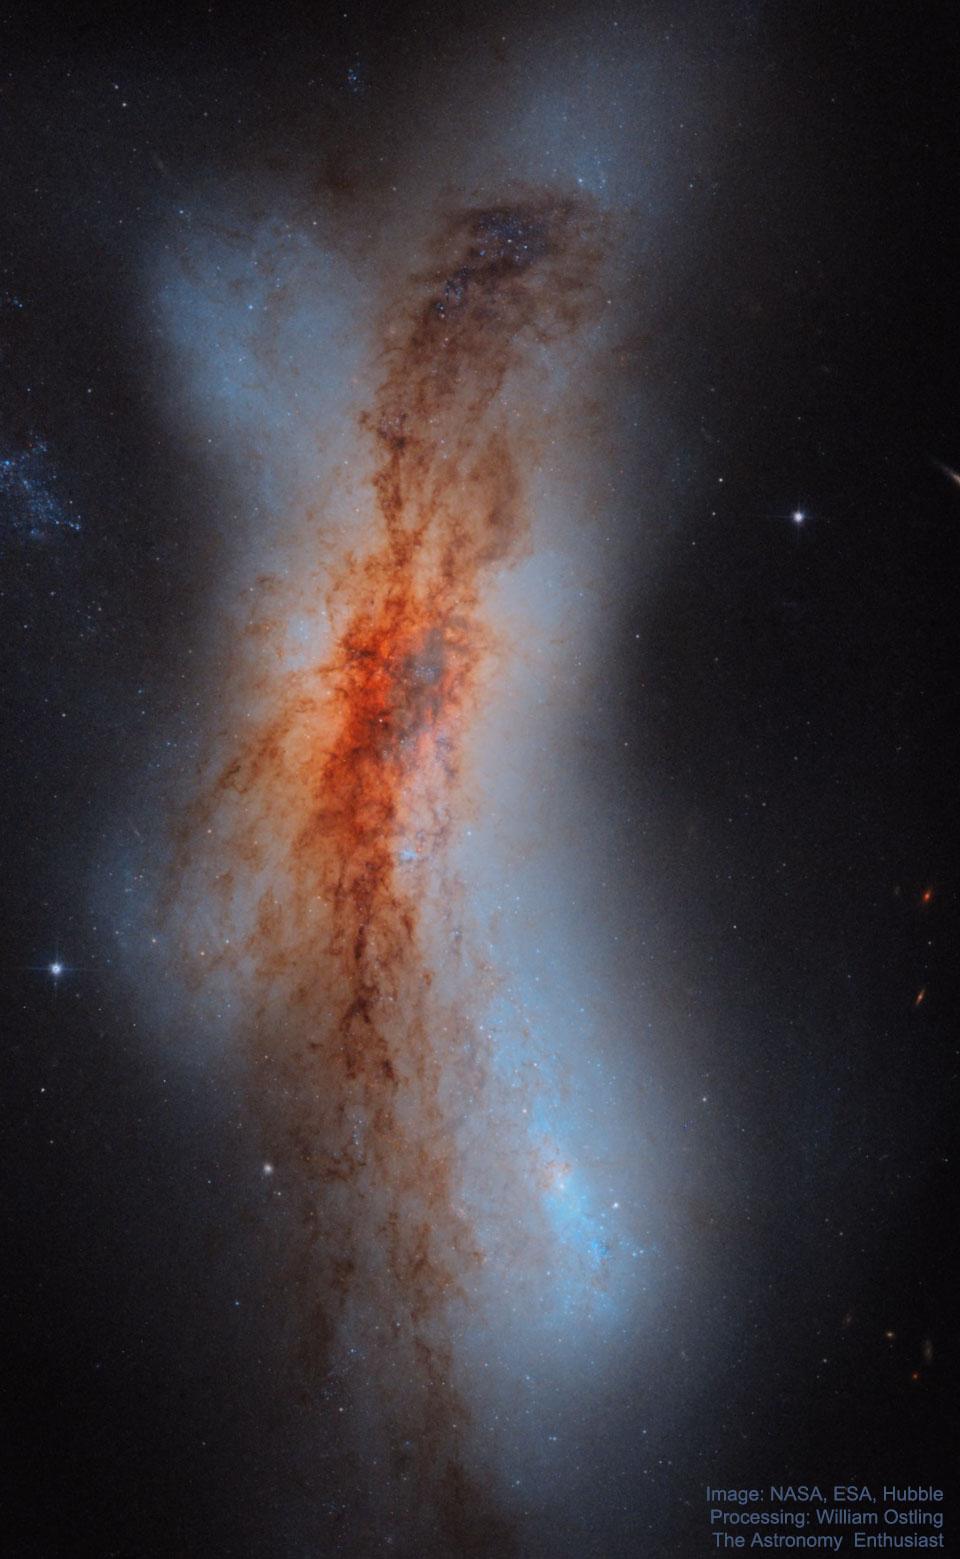 Les galaxies en collision de NGC 520